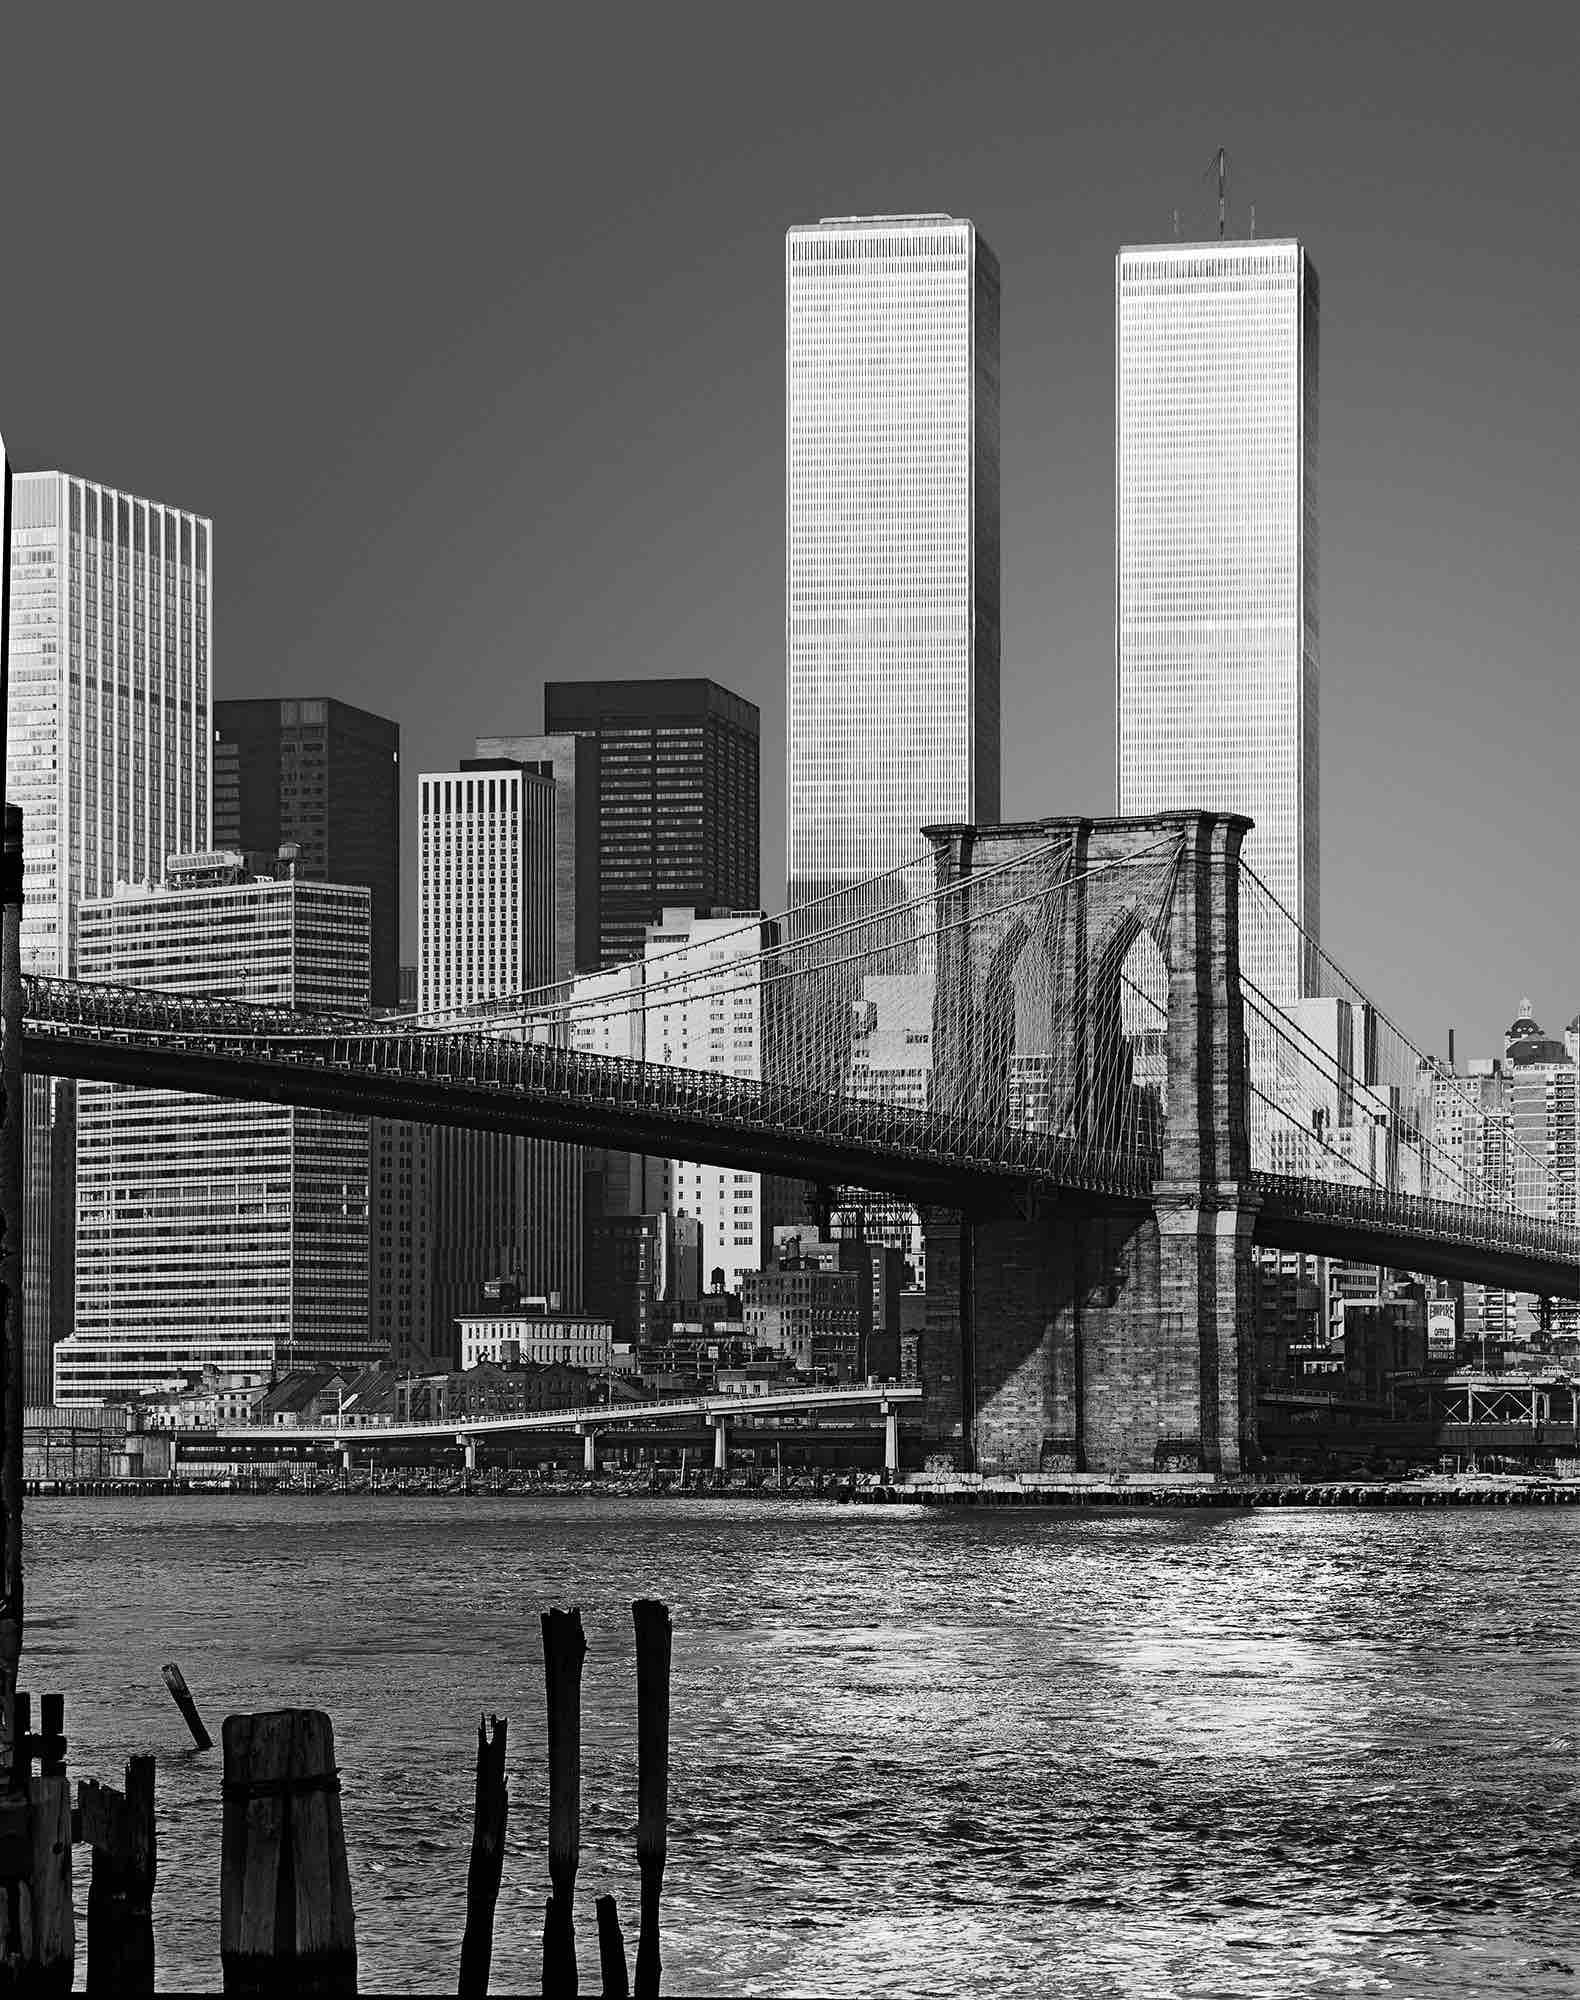 MInoru Yamasaki, World Trade Center (New York, NY) 1973